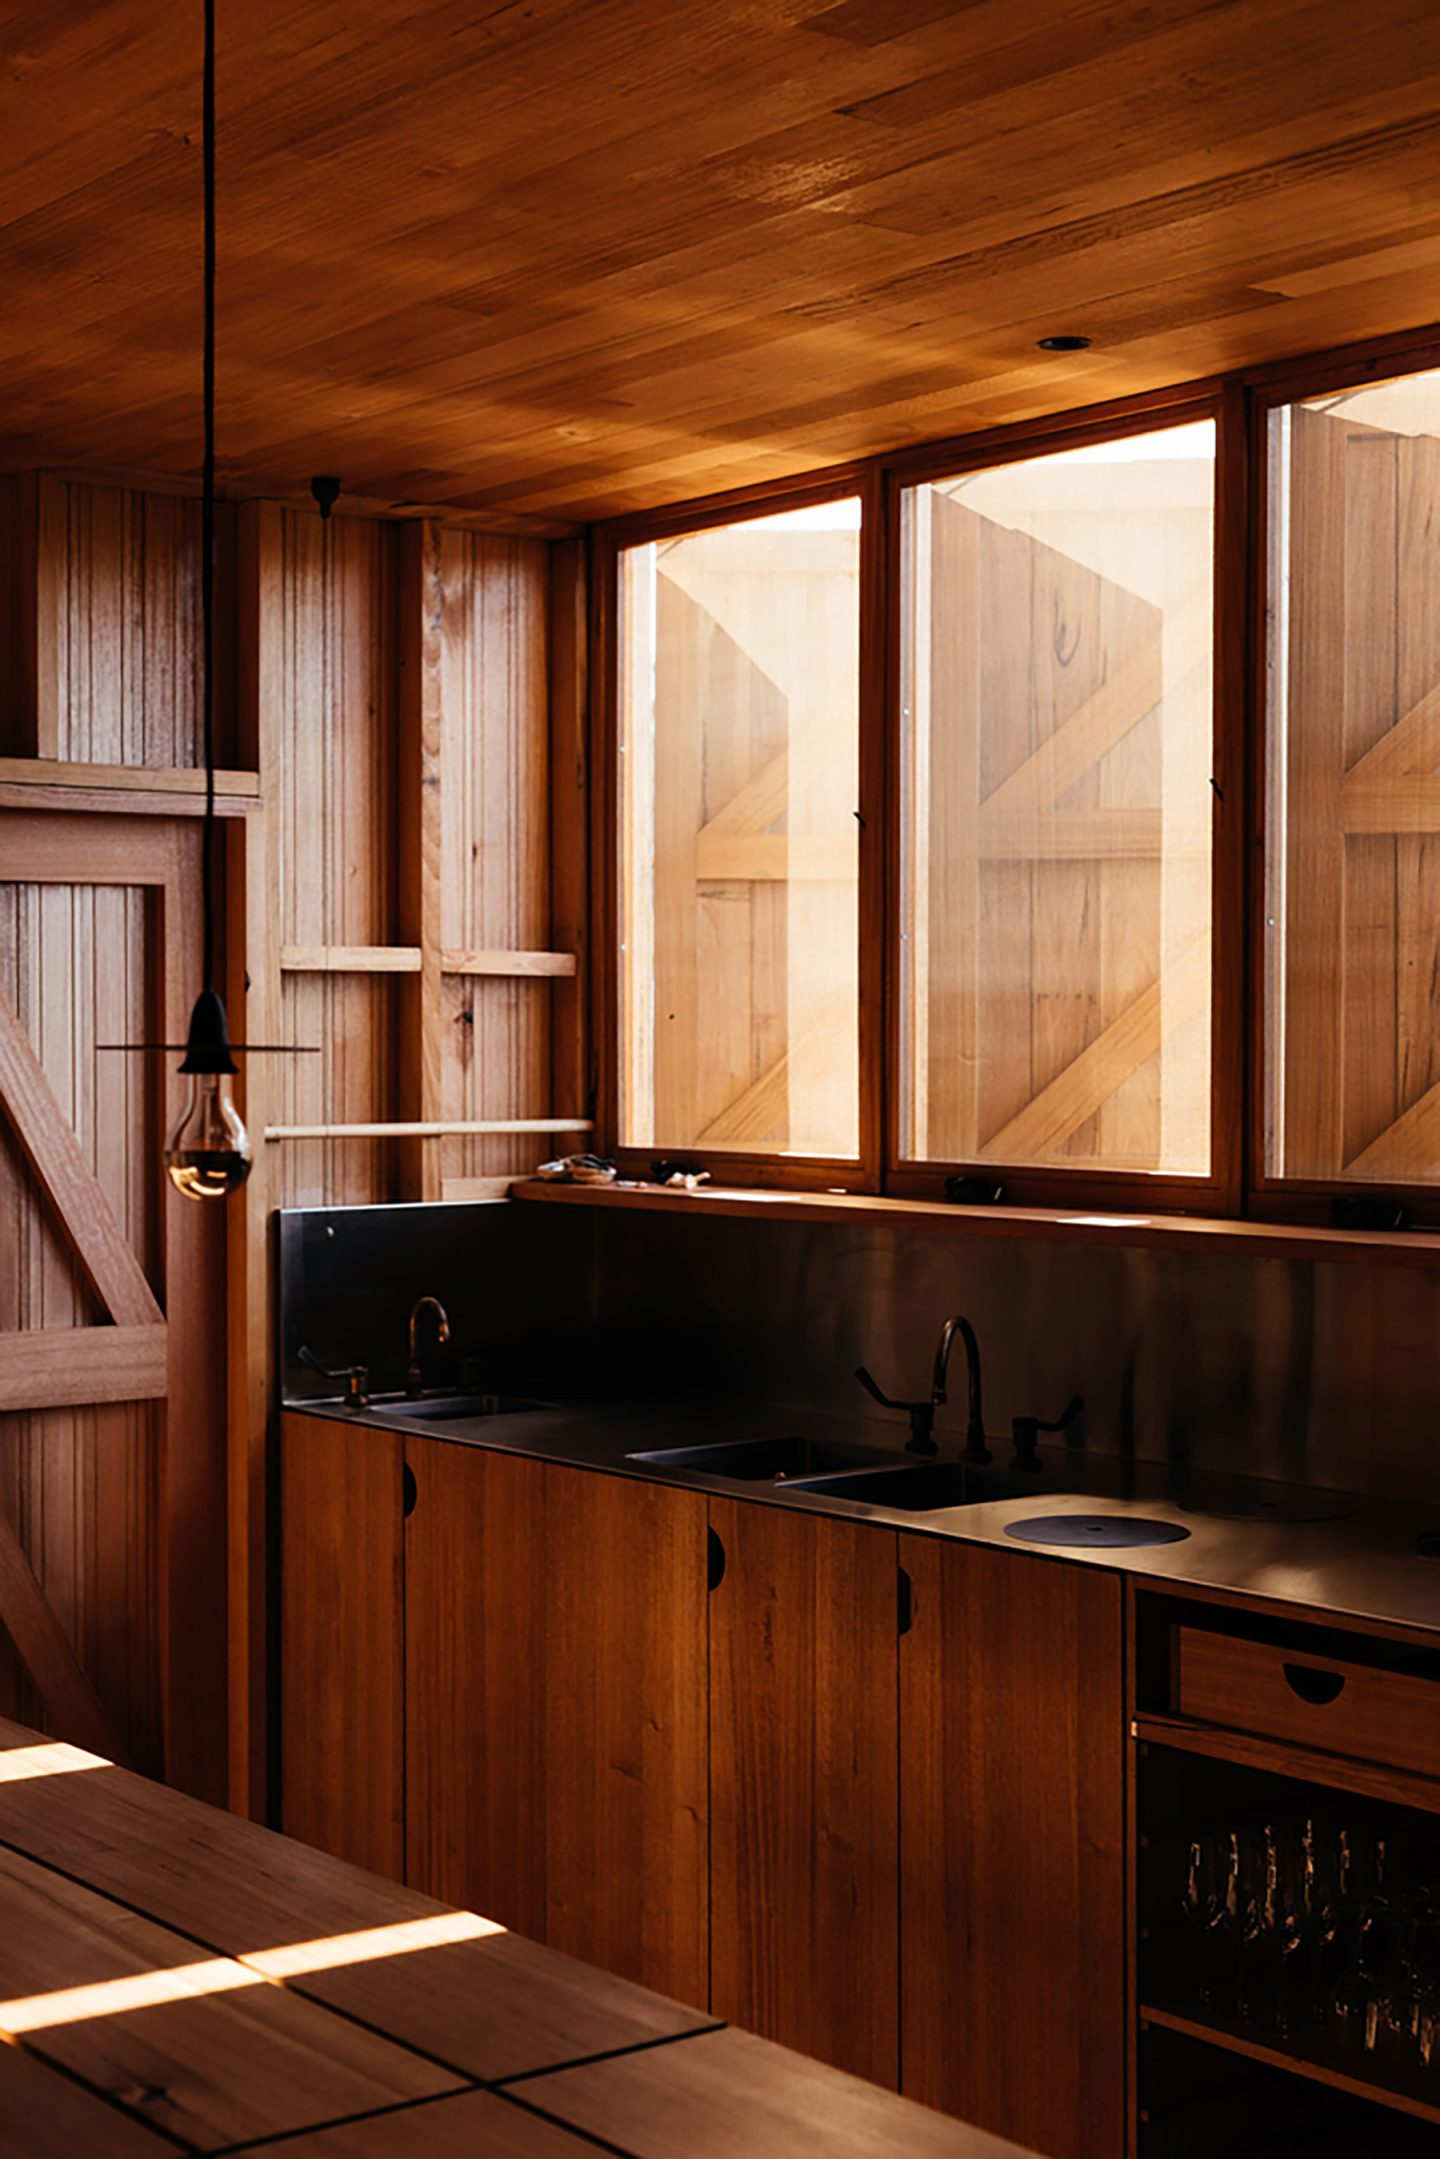 iGNANT-Architecture-Taylor-Hinds-Krakani-Lumi-006